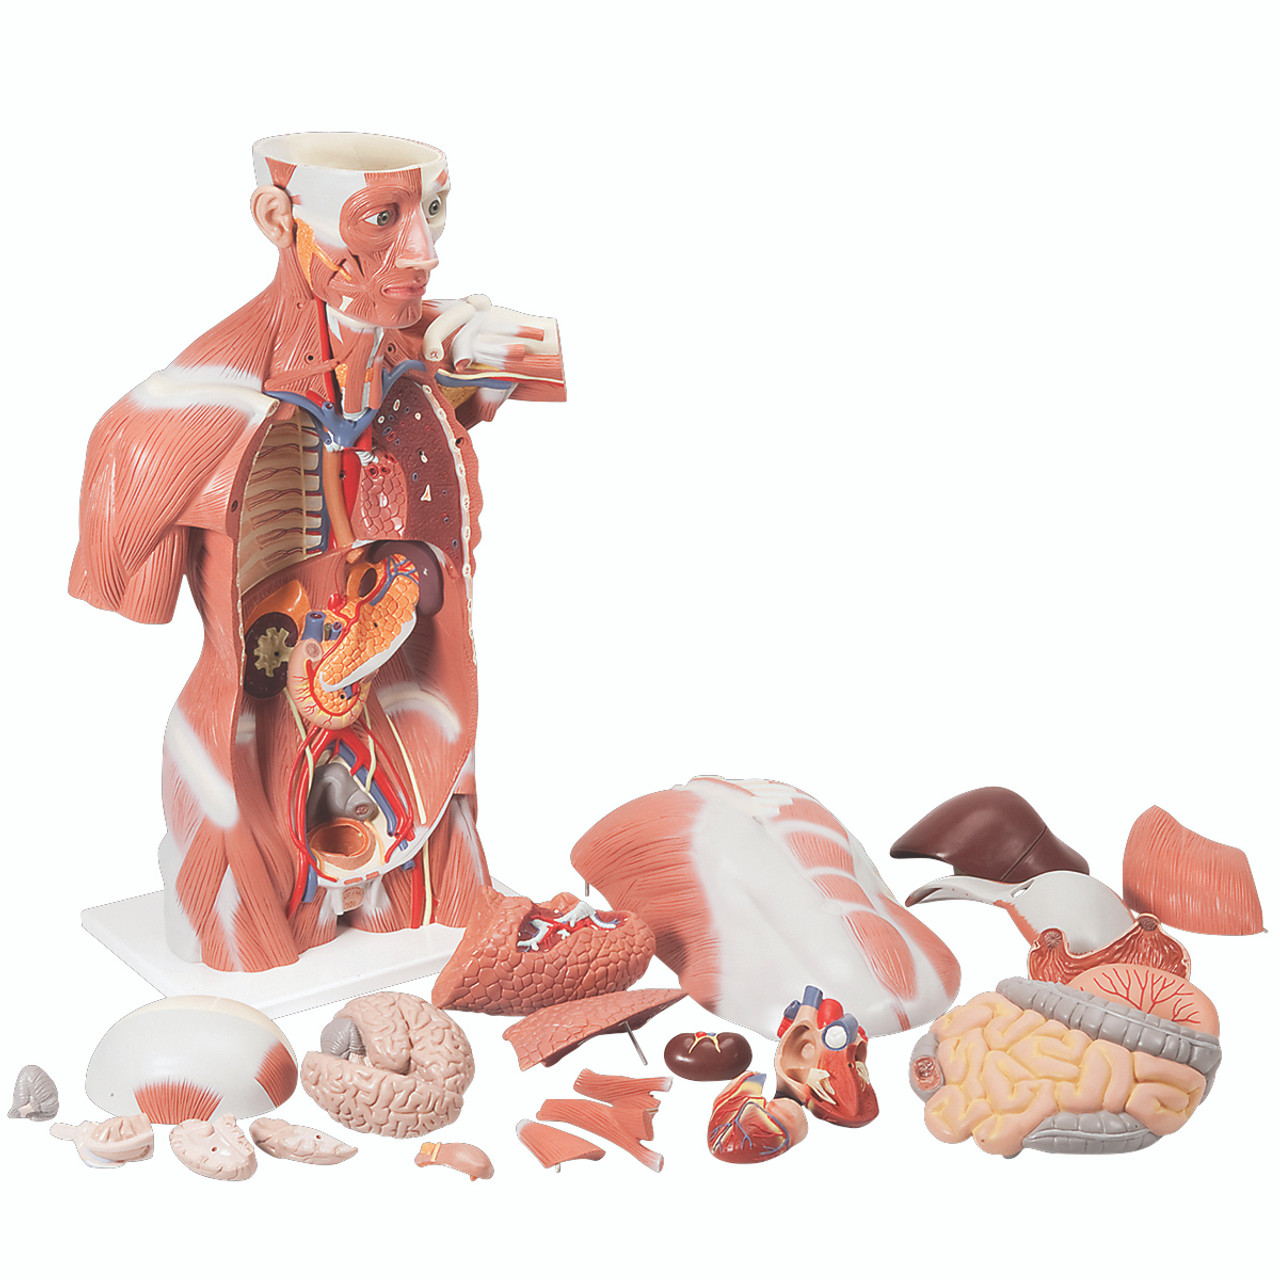 Anatomical Model - Life size Muscle Torso, 27 part